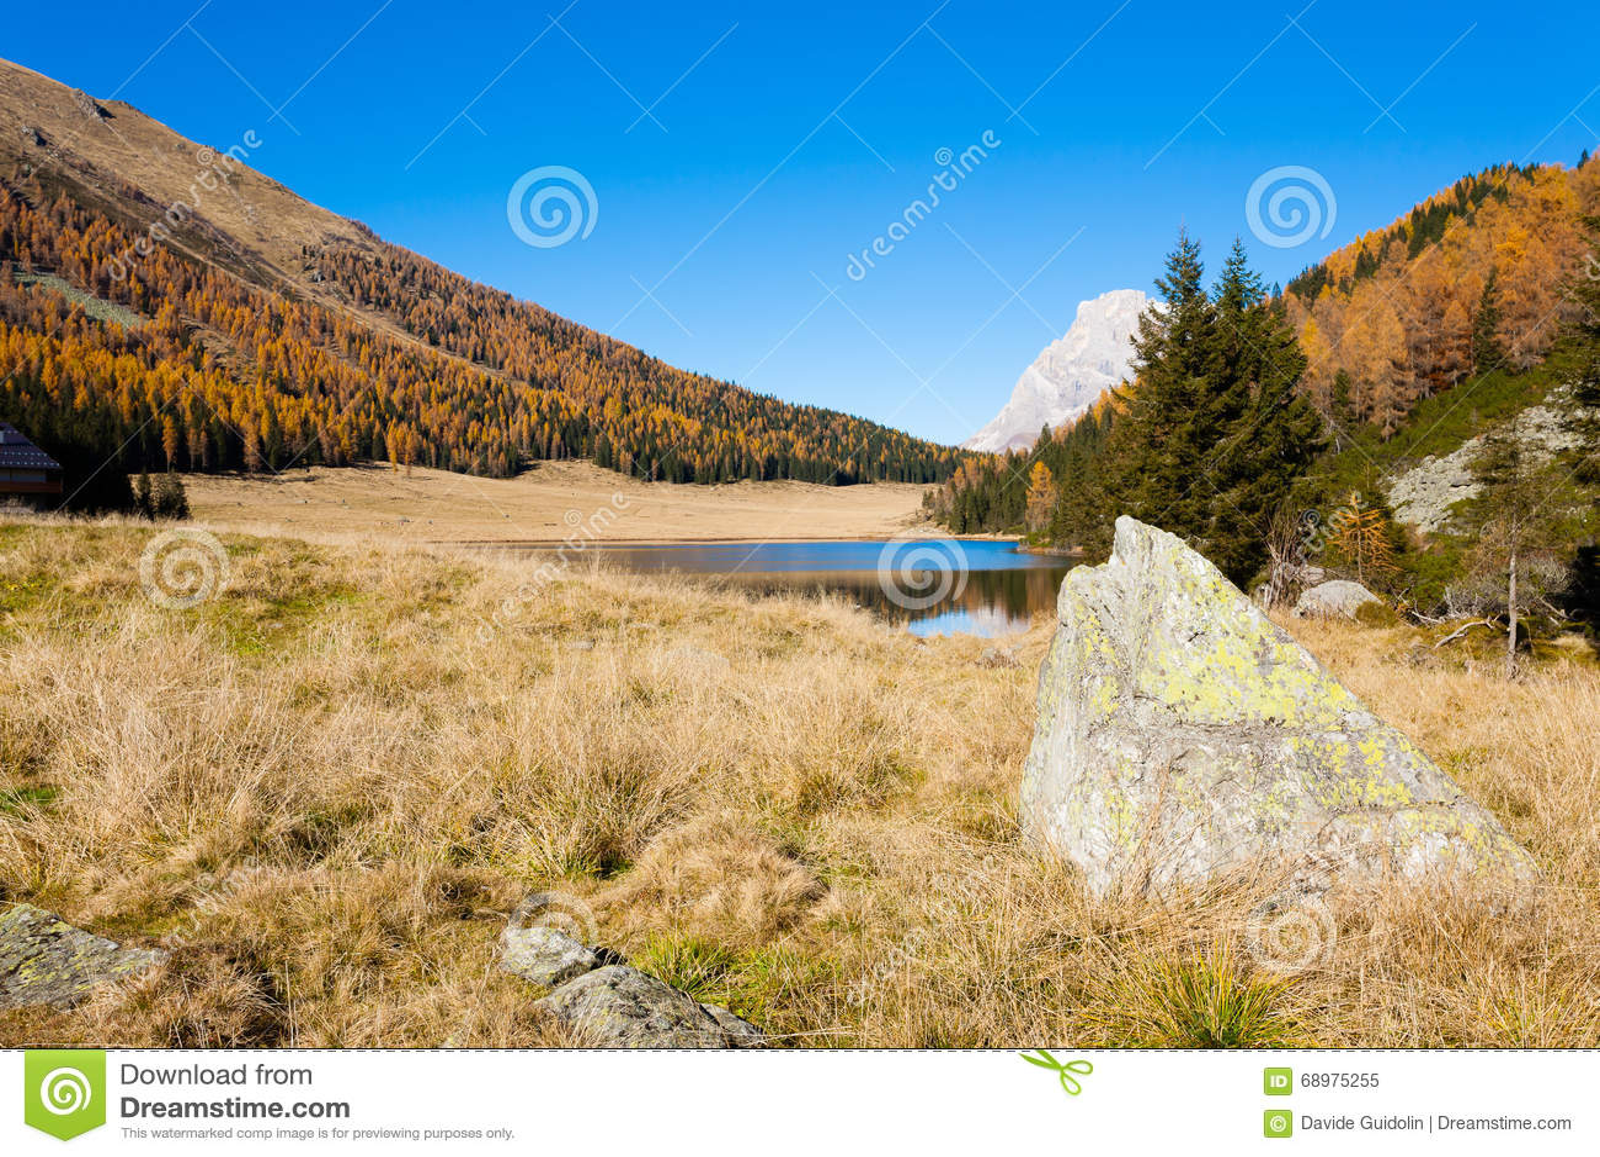 Panorama del lago, otoño